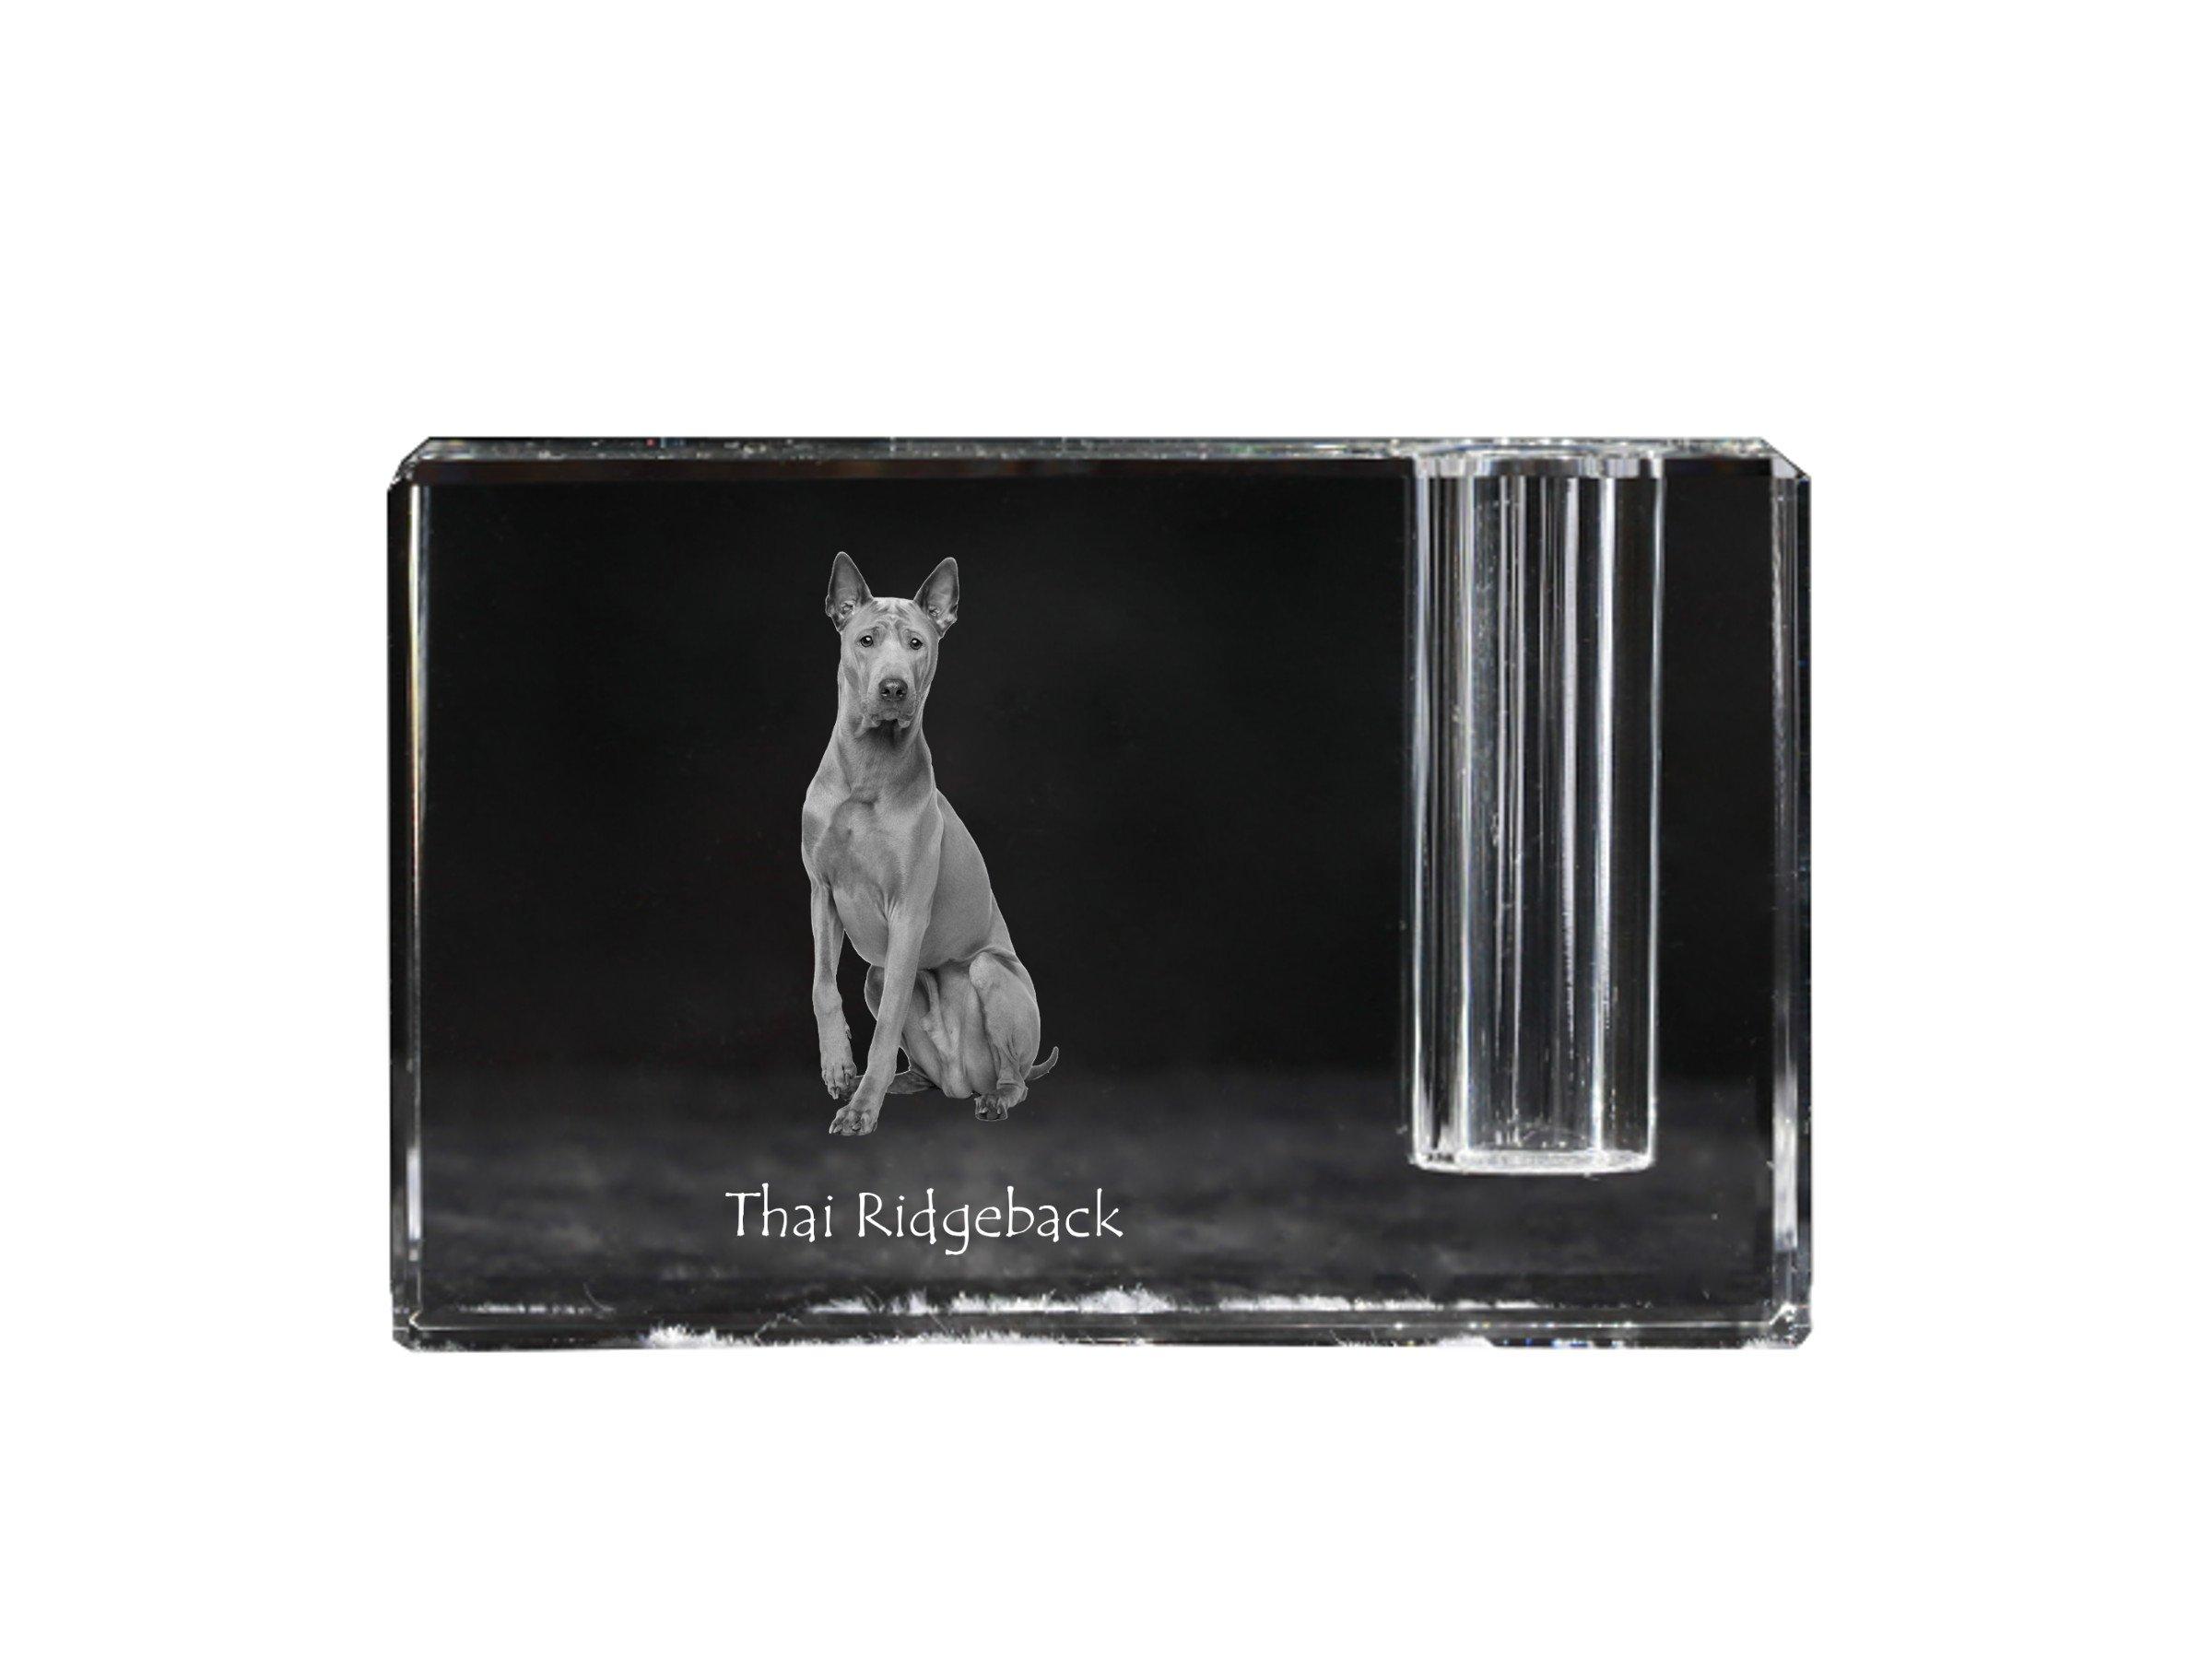 Thai Ridgeback, crystal pen holder with dog, souvenir, desk accessory, limited edition